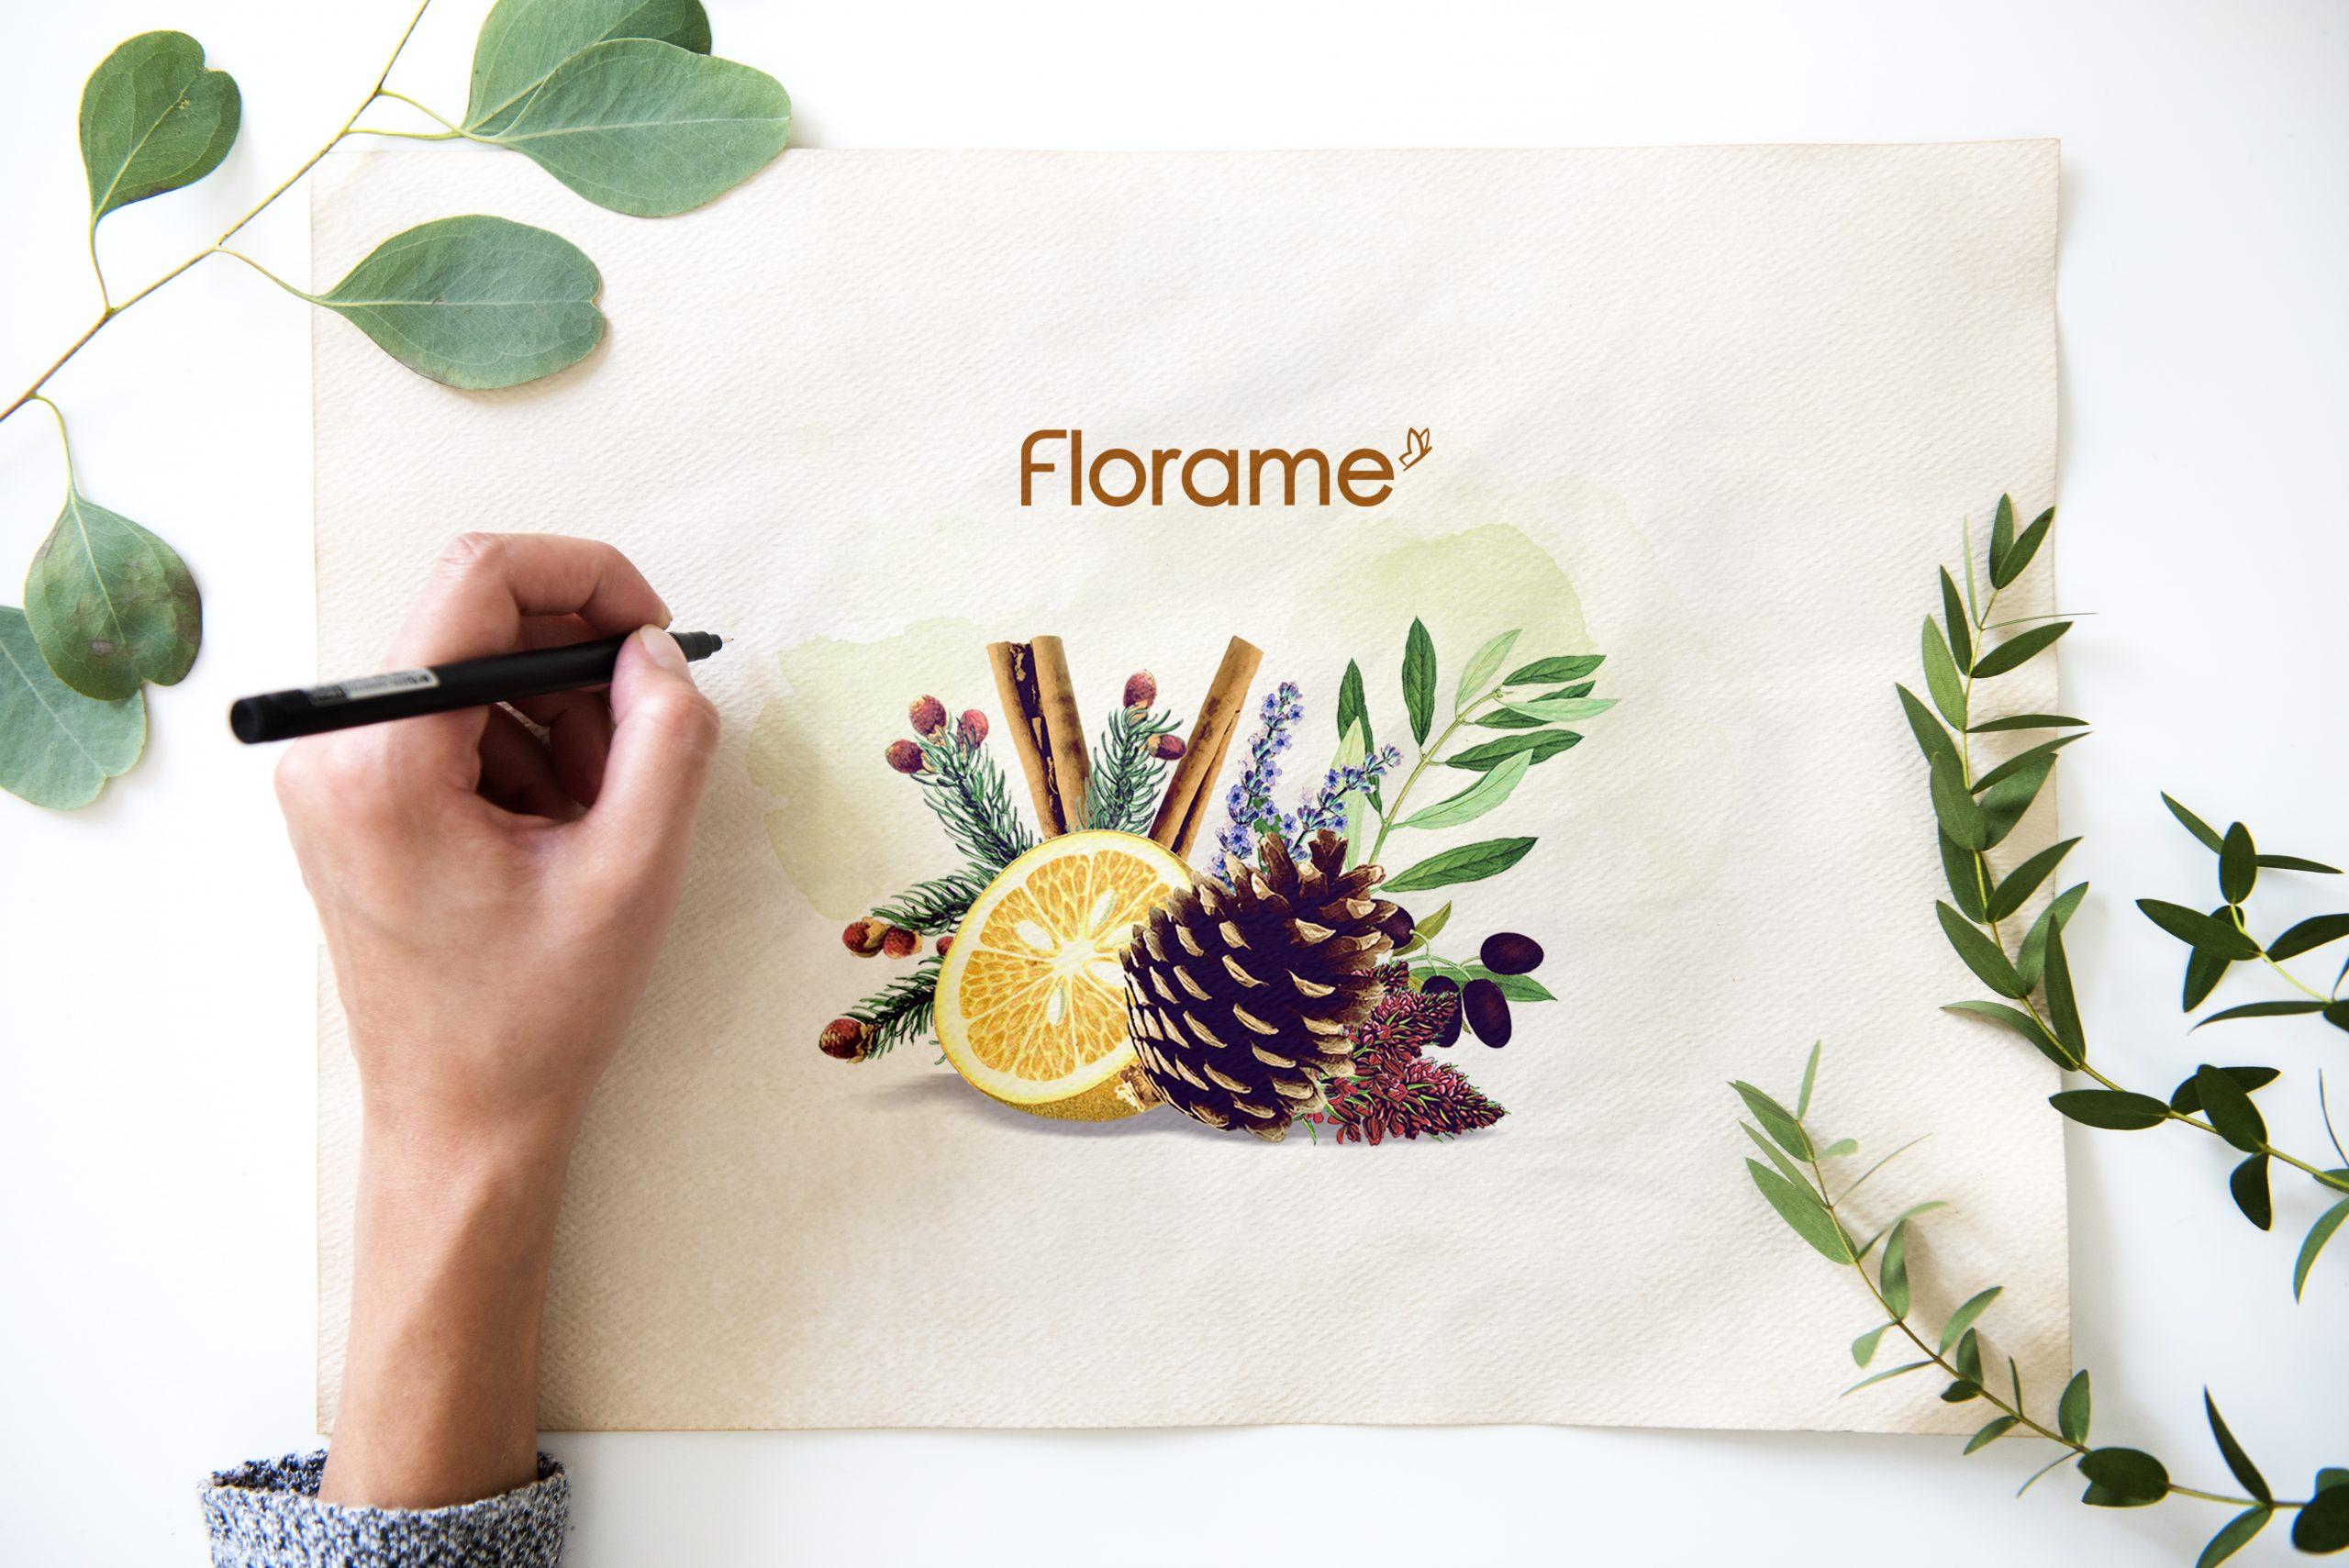 Florame Huiles Essentielles